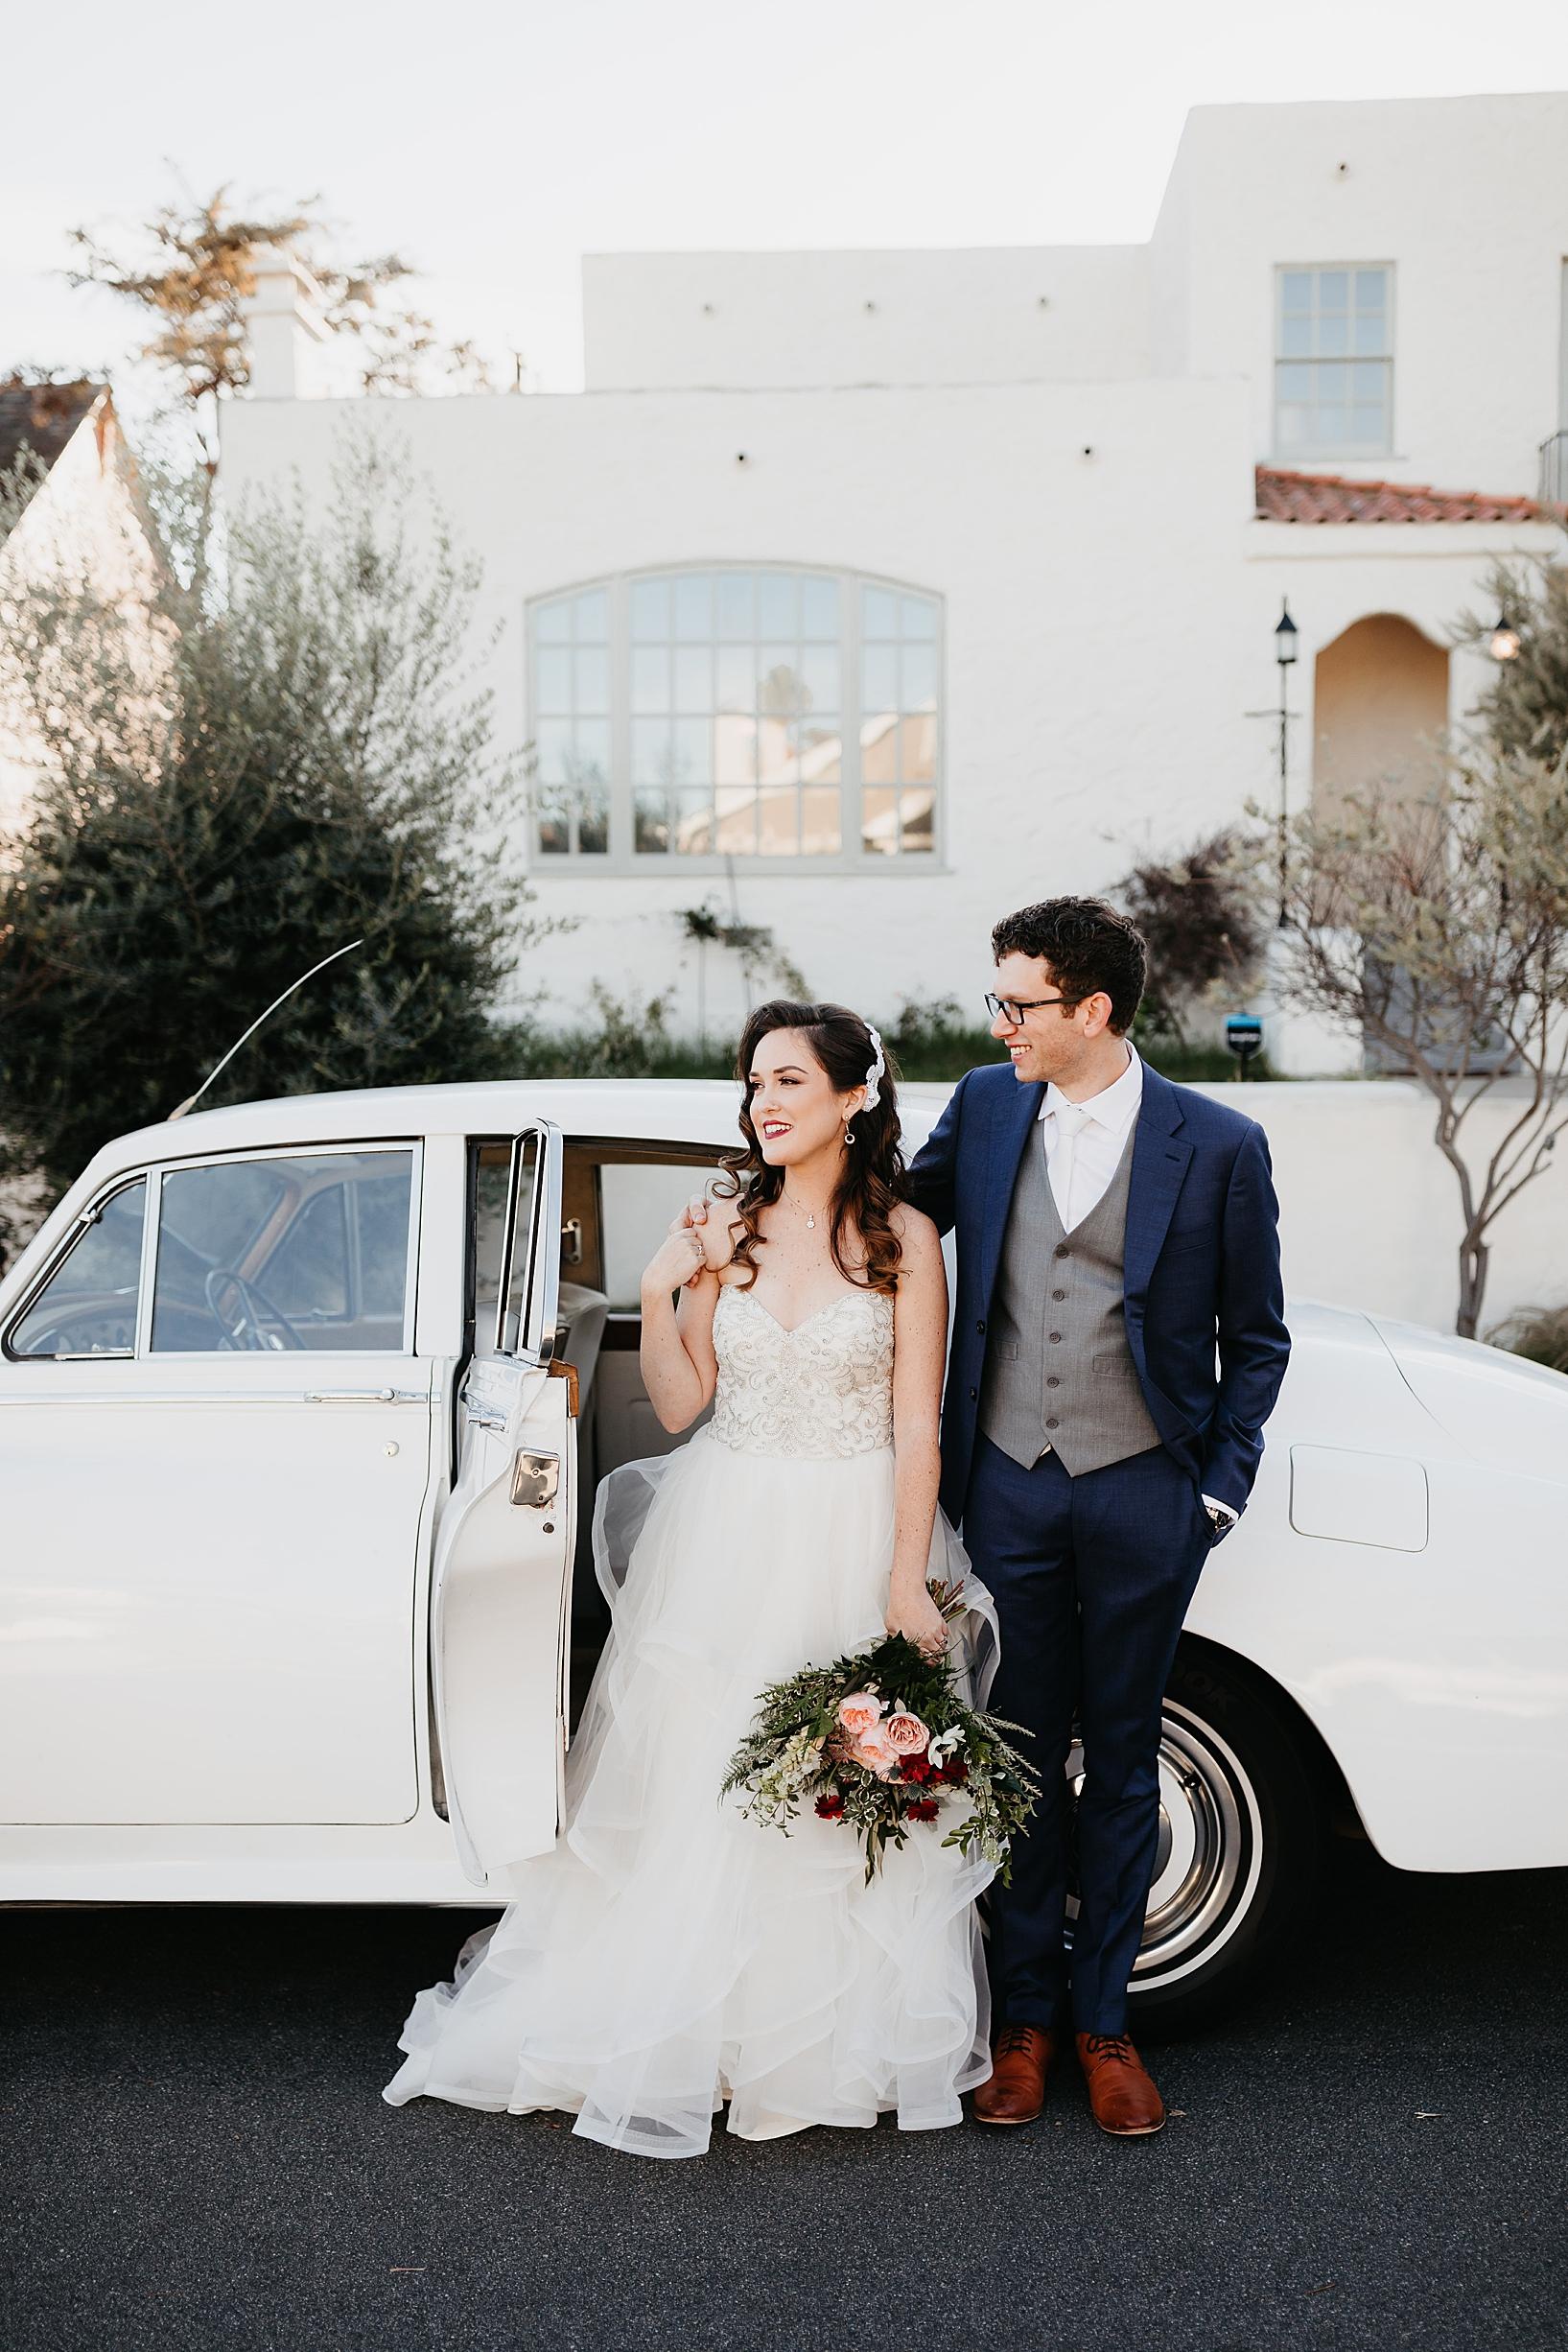 Brick-San-Diego-Winter-Wedding-29.jpg